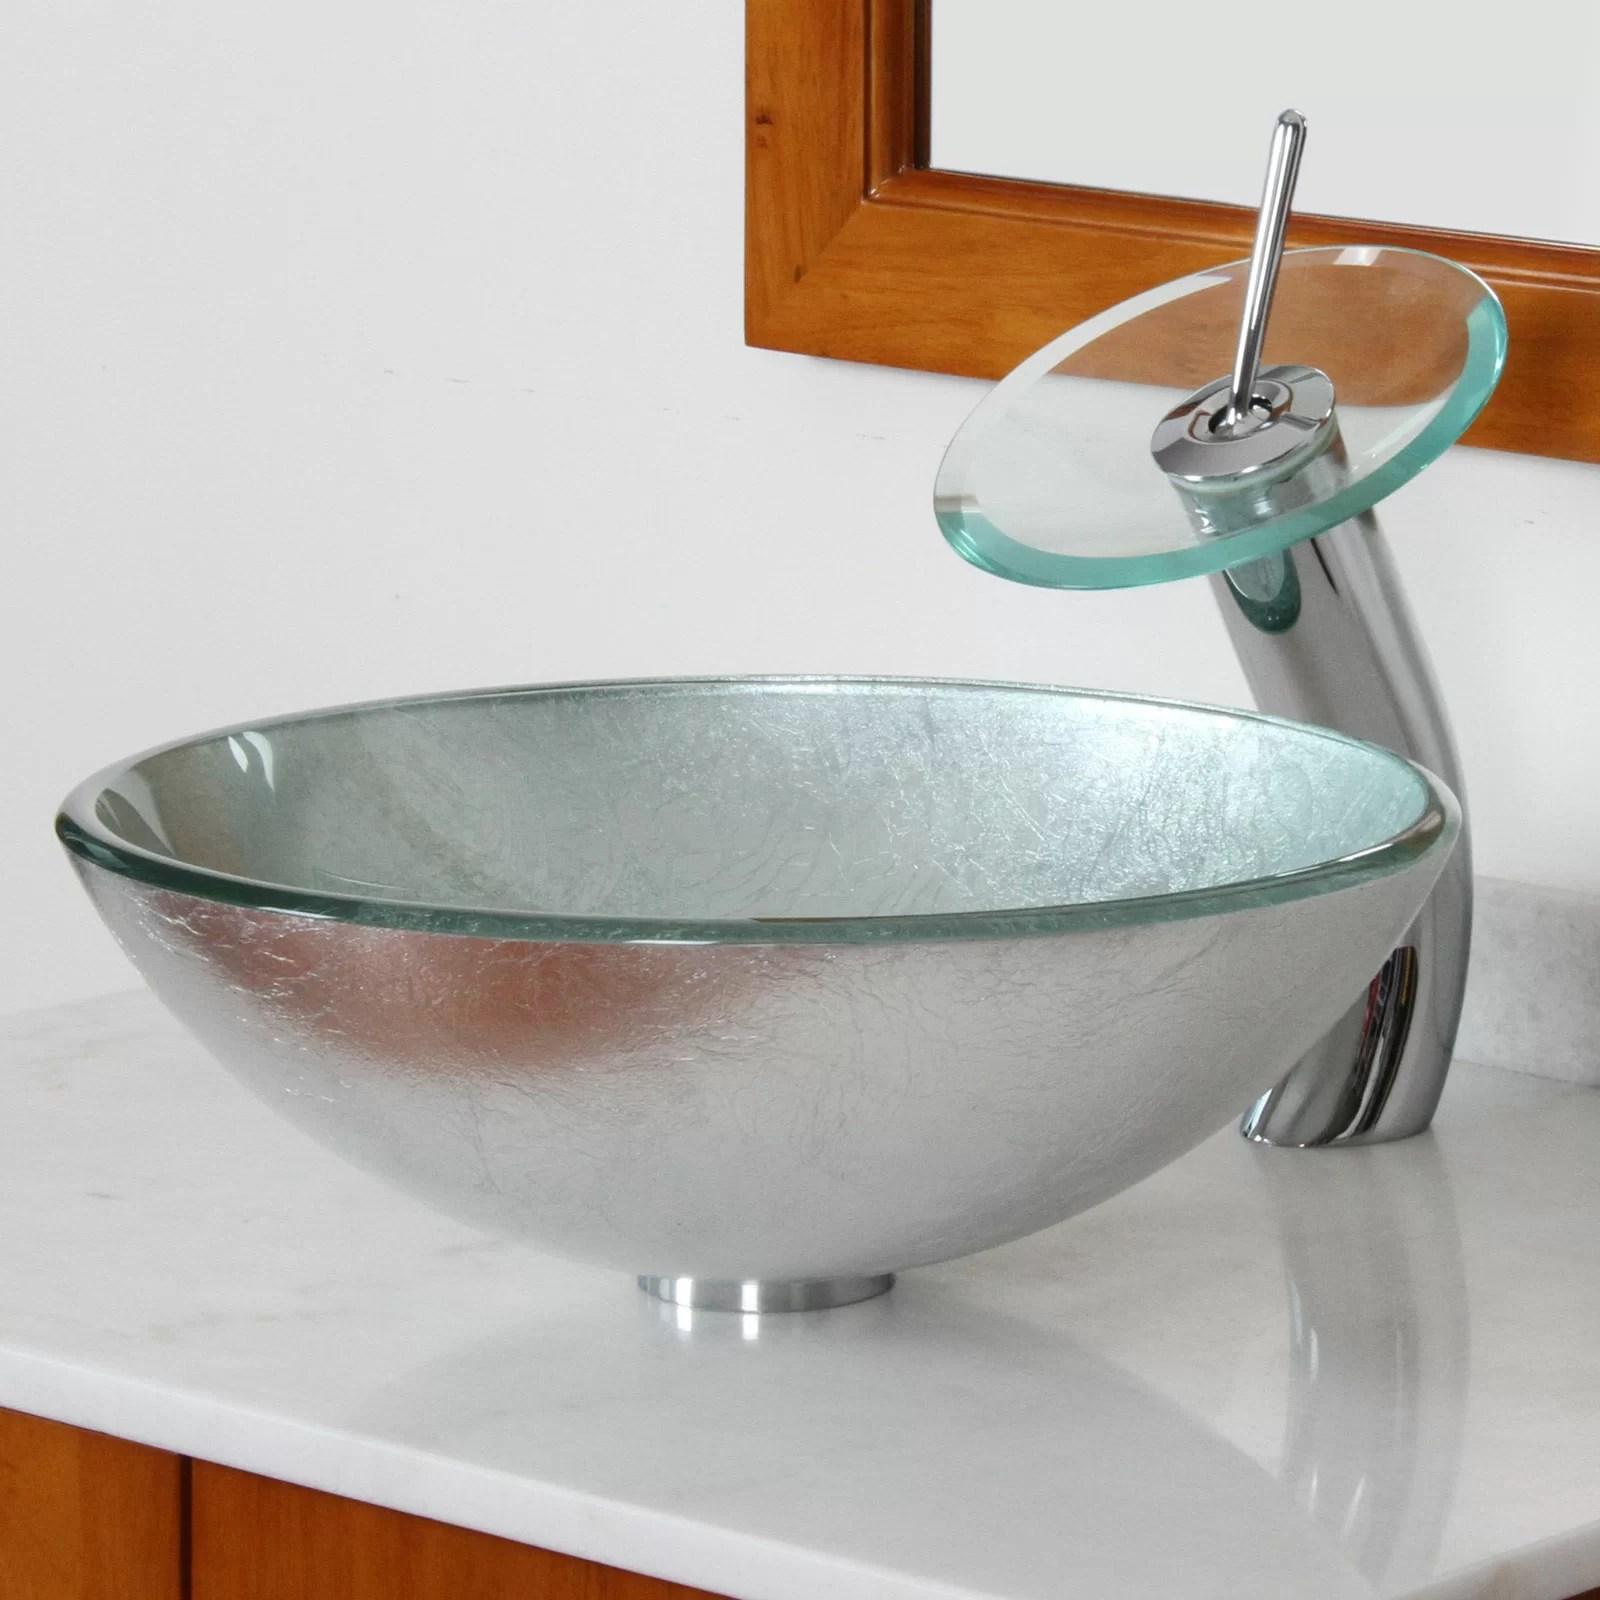 Elite Hand Painted Foil Round Bowl Vessel Bathroom Sink